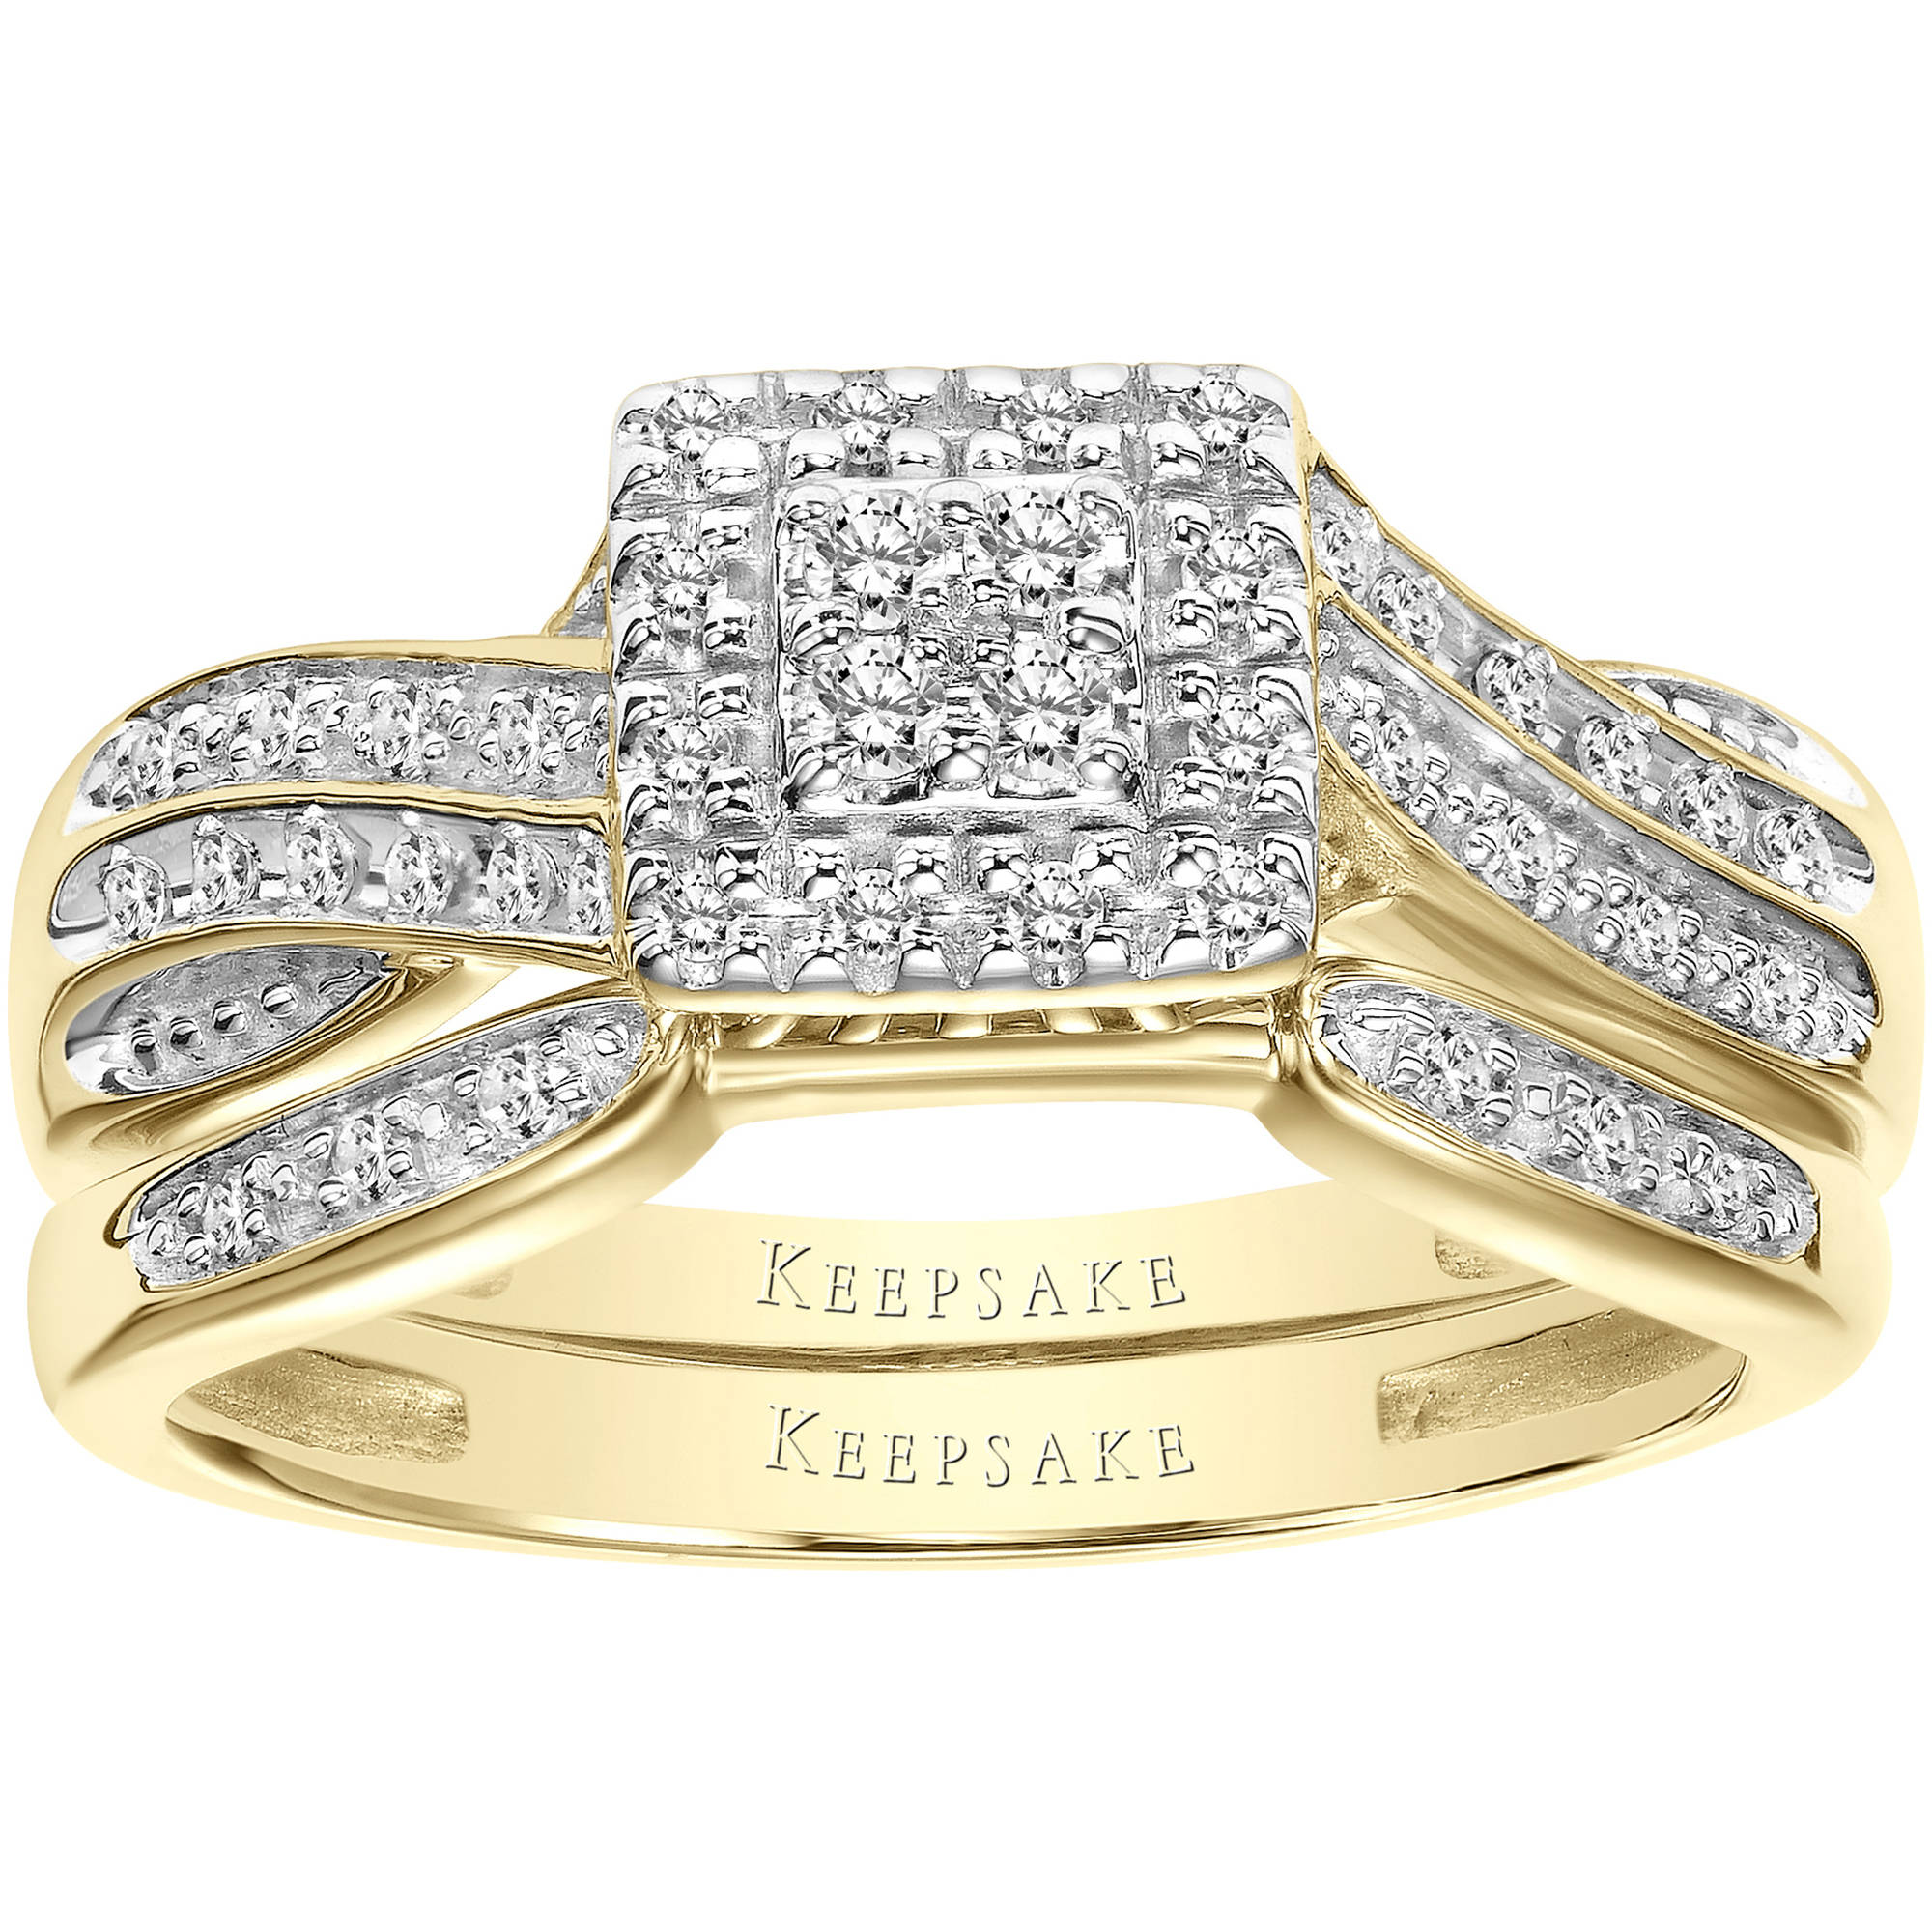 Keepsake Infinite 1 4 Carat T.W. Certified Diamond 10kt Yellow Gold Bridal Set by Frederick Goldman Inc.